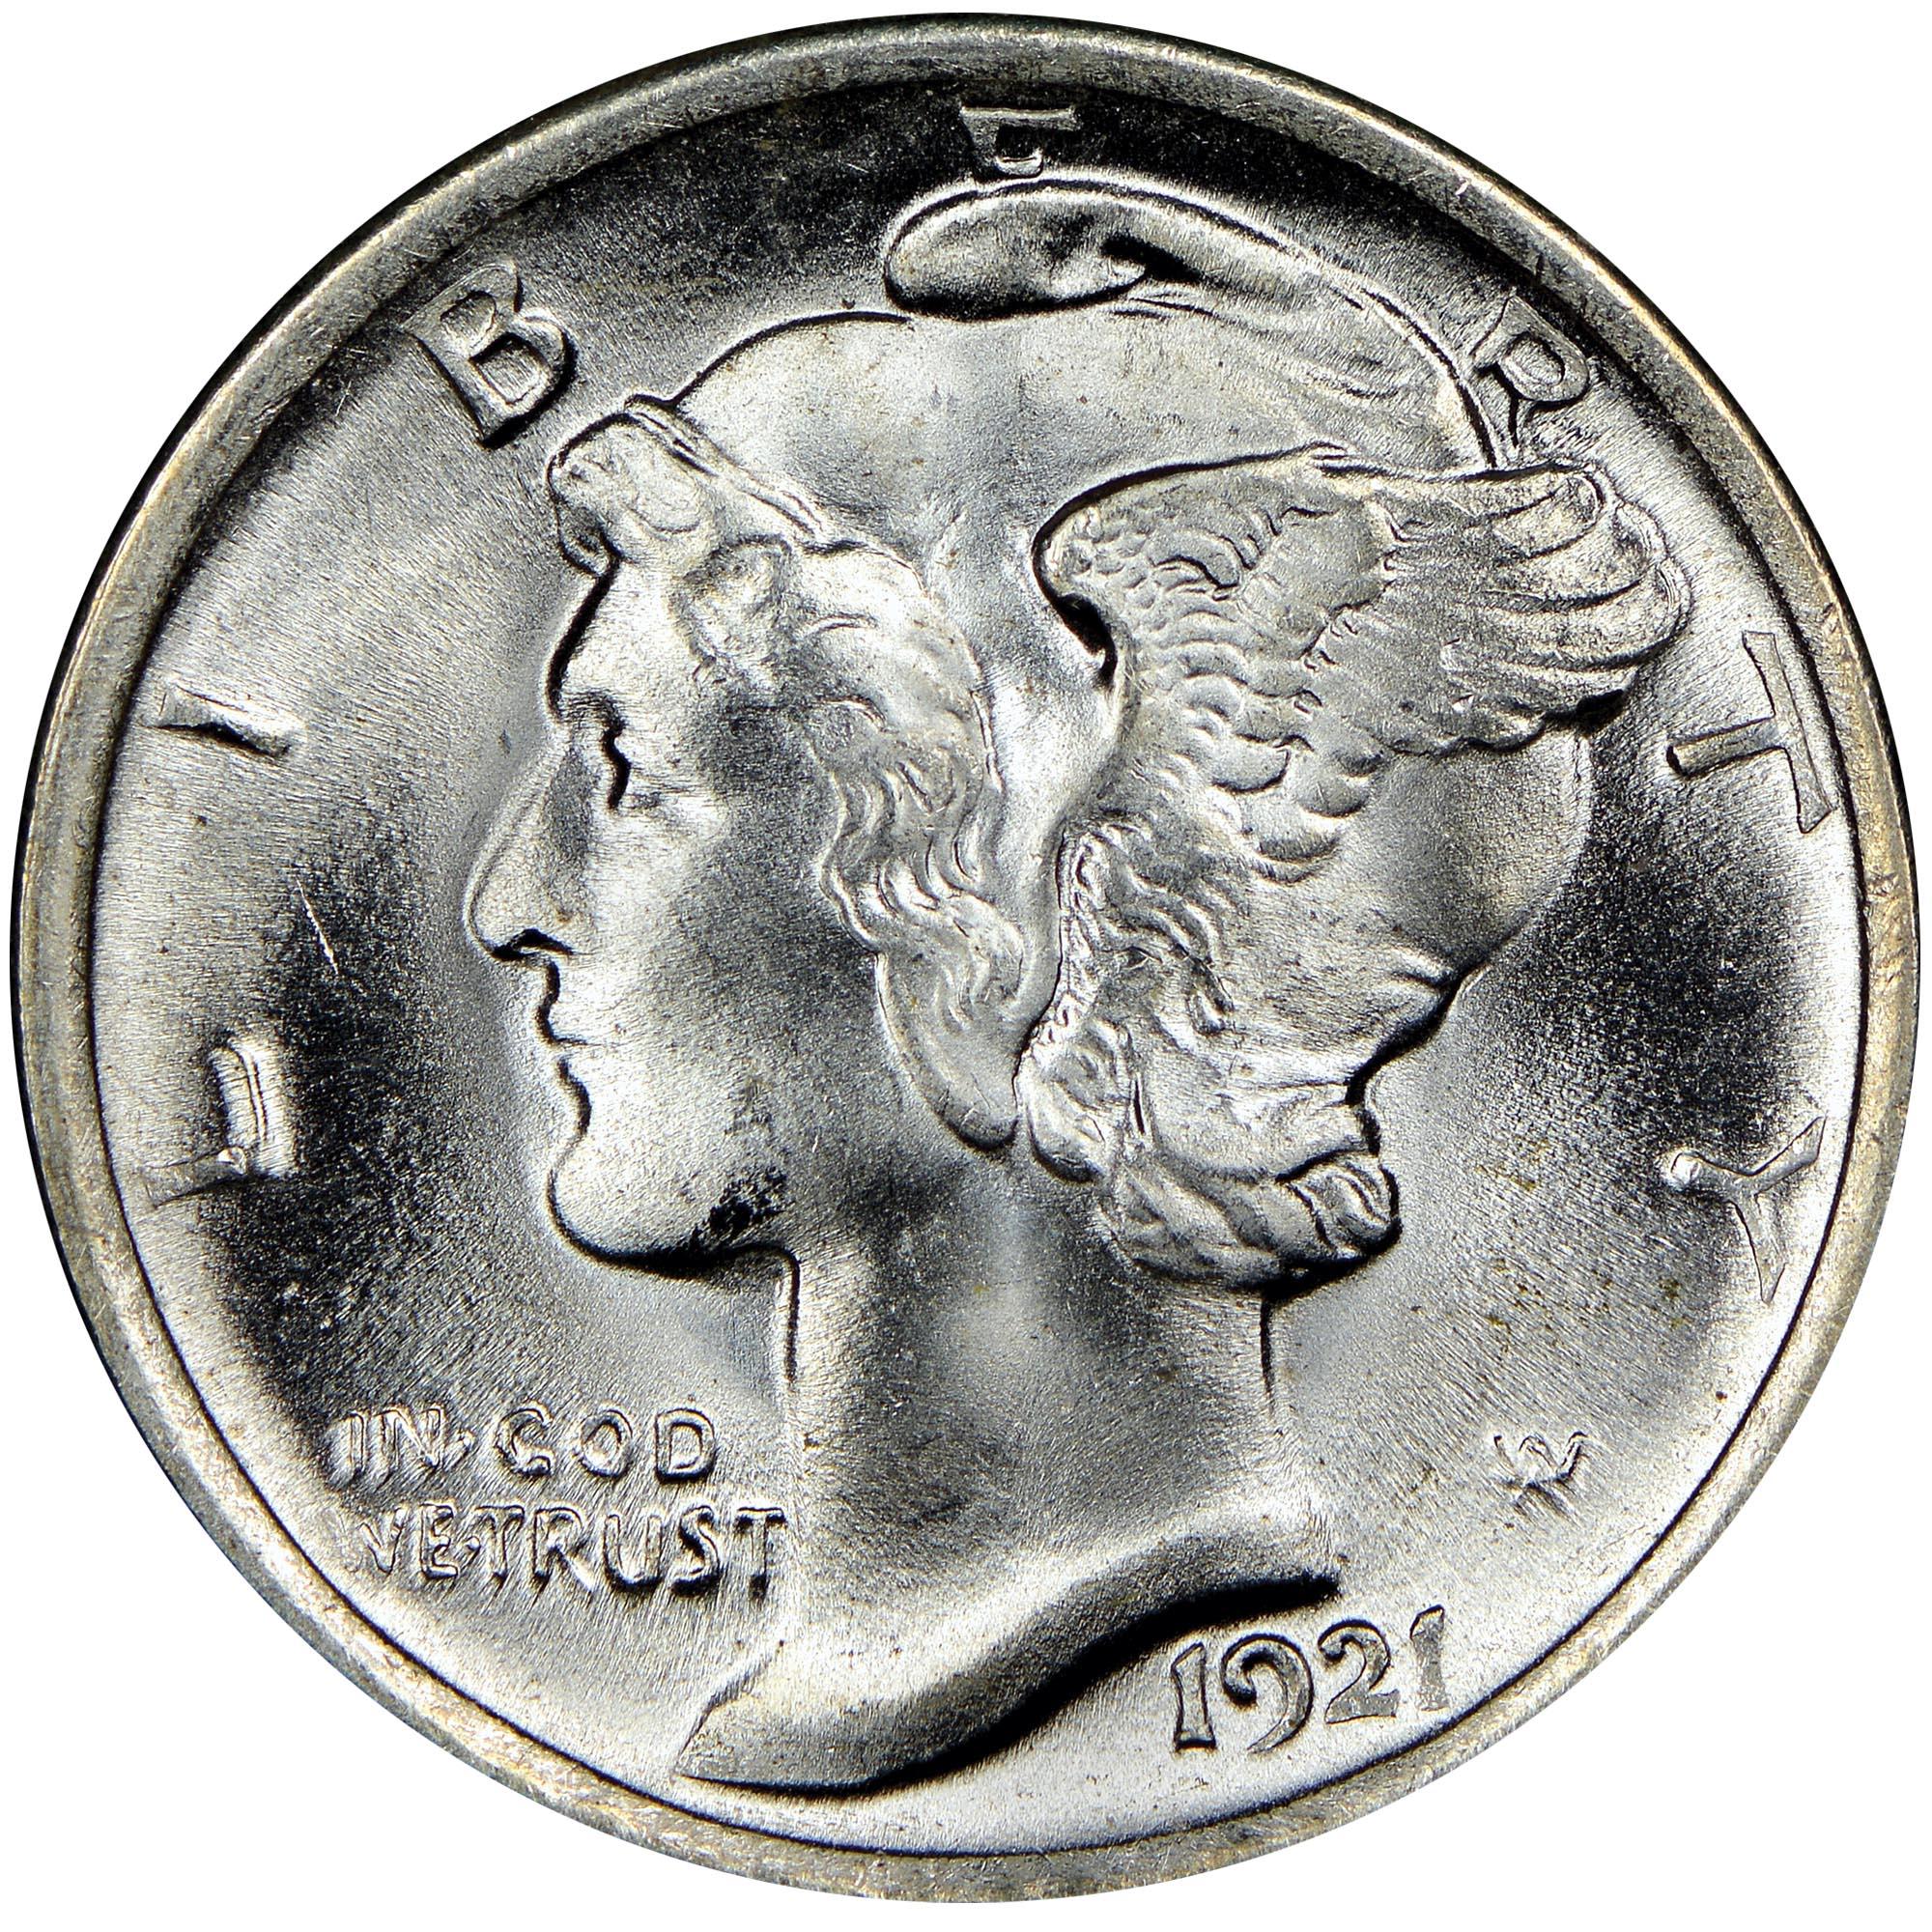 1920 D Silver Mercury Dime 10c Average Circulated